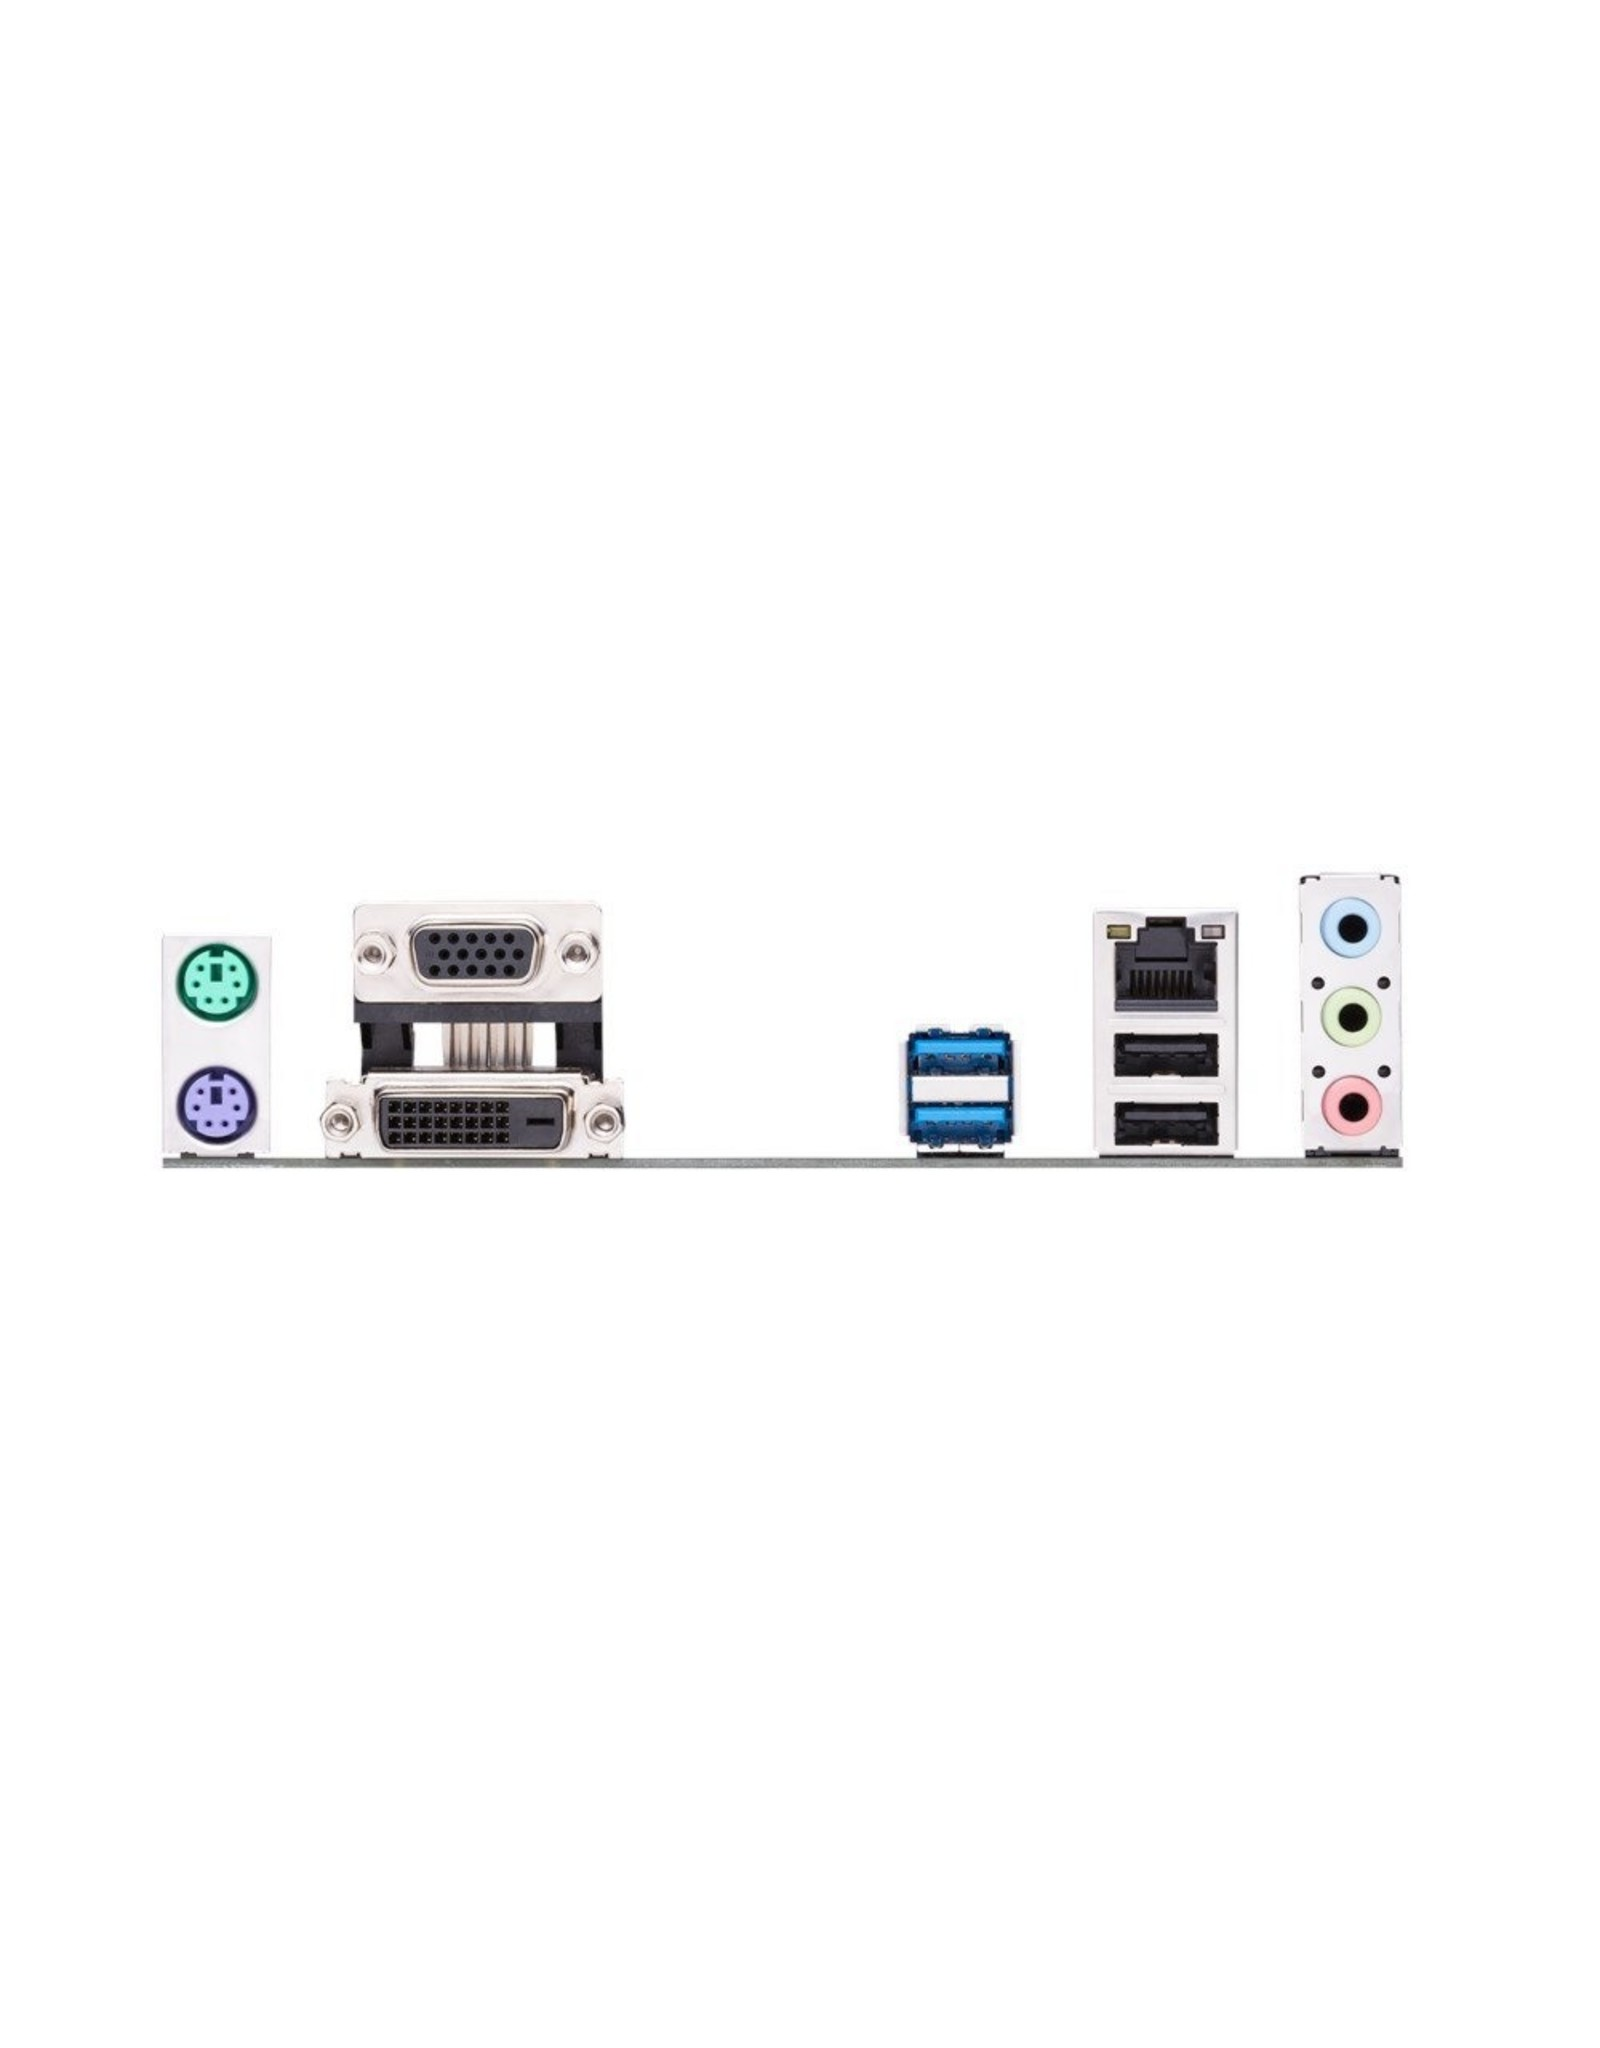 Asus MB  Prime H310M-K R.2/ 1151 8th comp / 2x DDR4 /  M-ATX